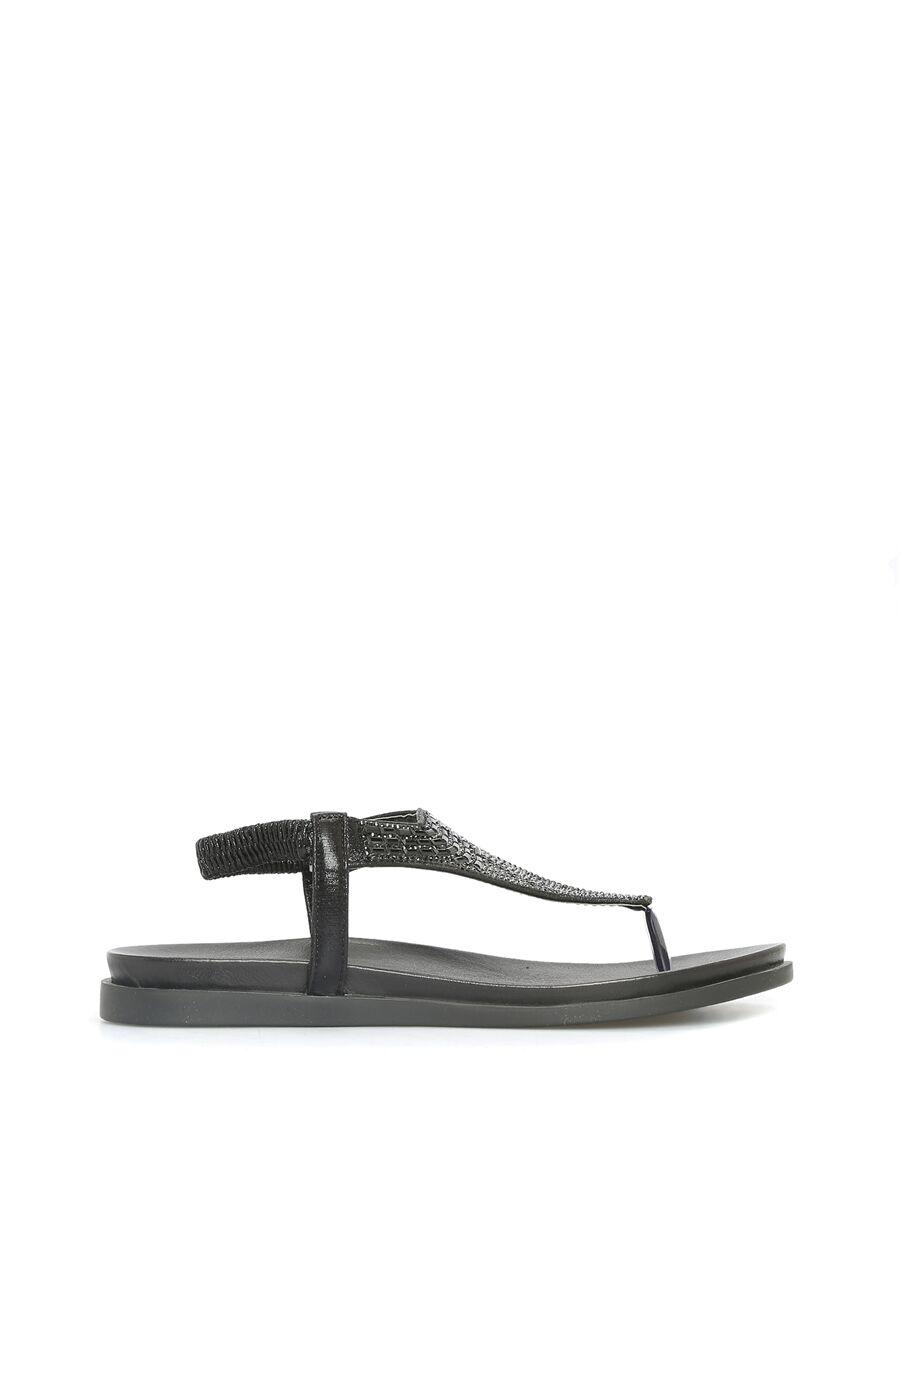 Dıvarese Taşlı Siyah Sandalet – 299.5 TL